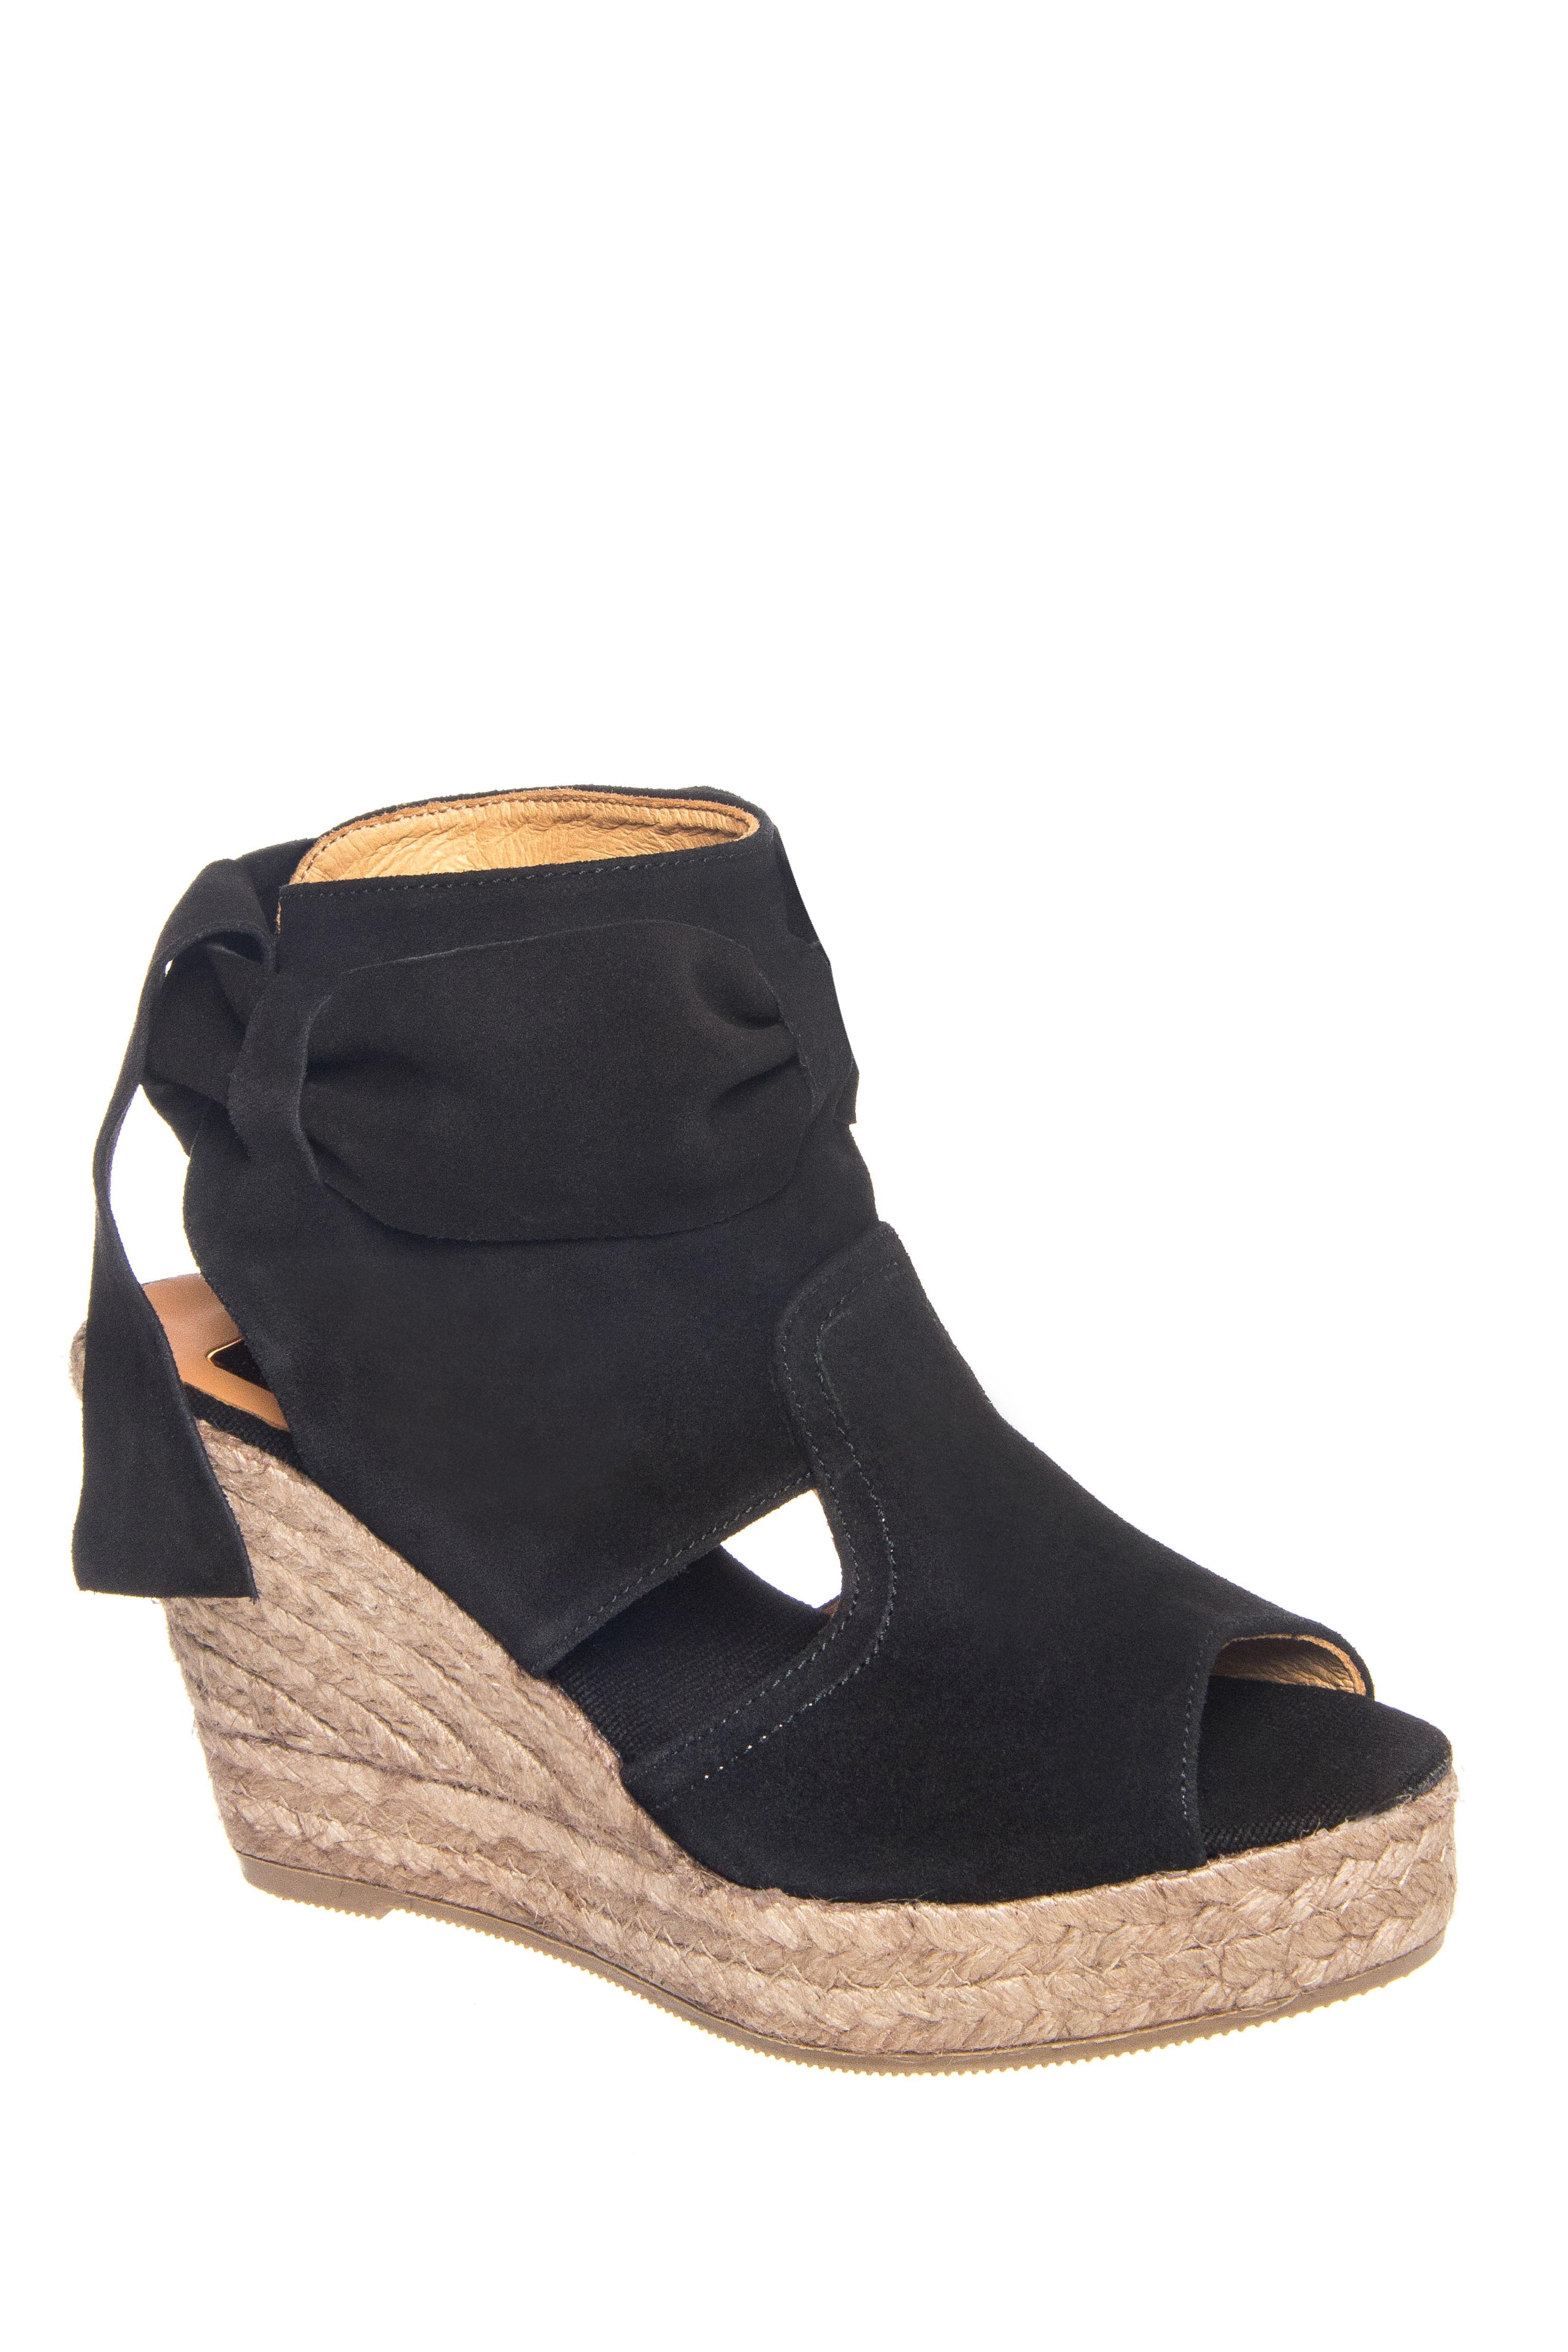 Kanna Basket Topo High Wedge Sandals